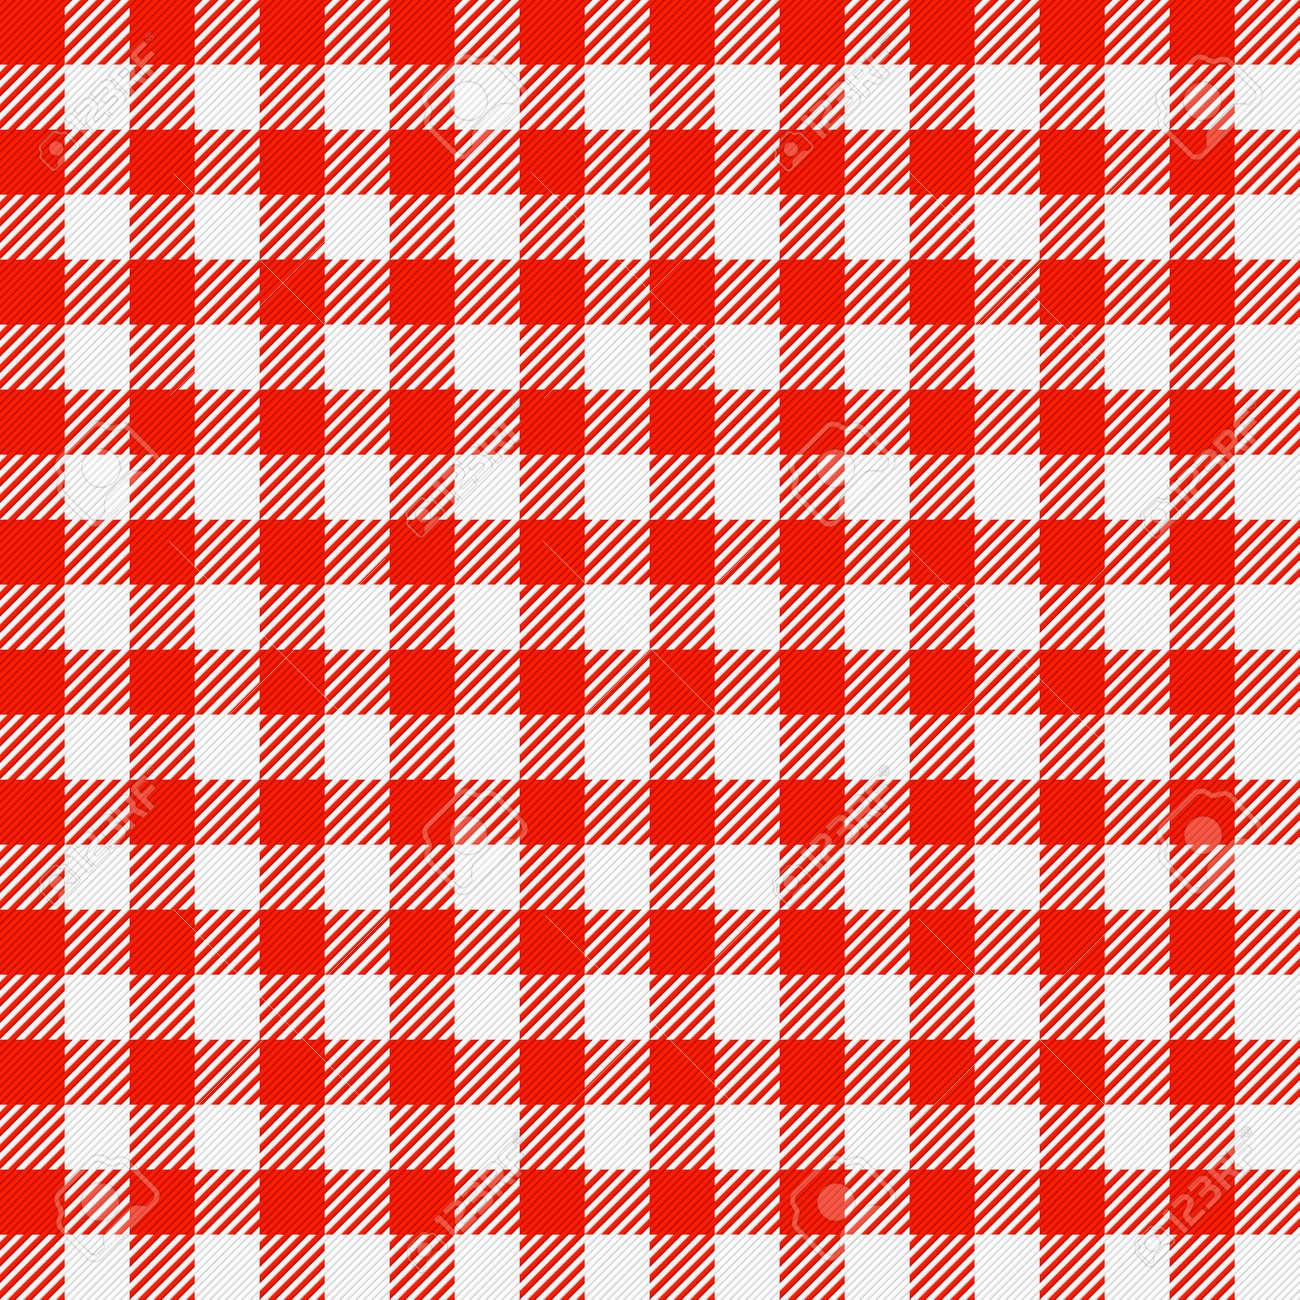 Captivating Checkered Tablecloth Seamless Stock Vector   13963686